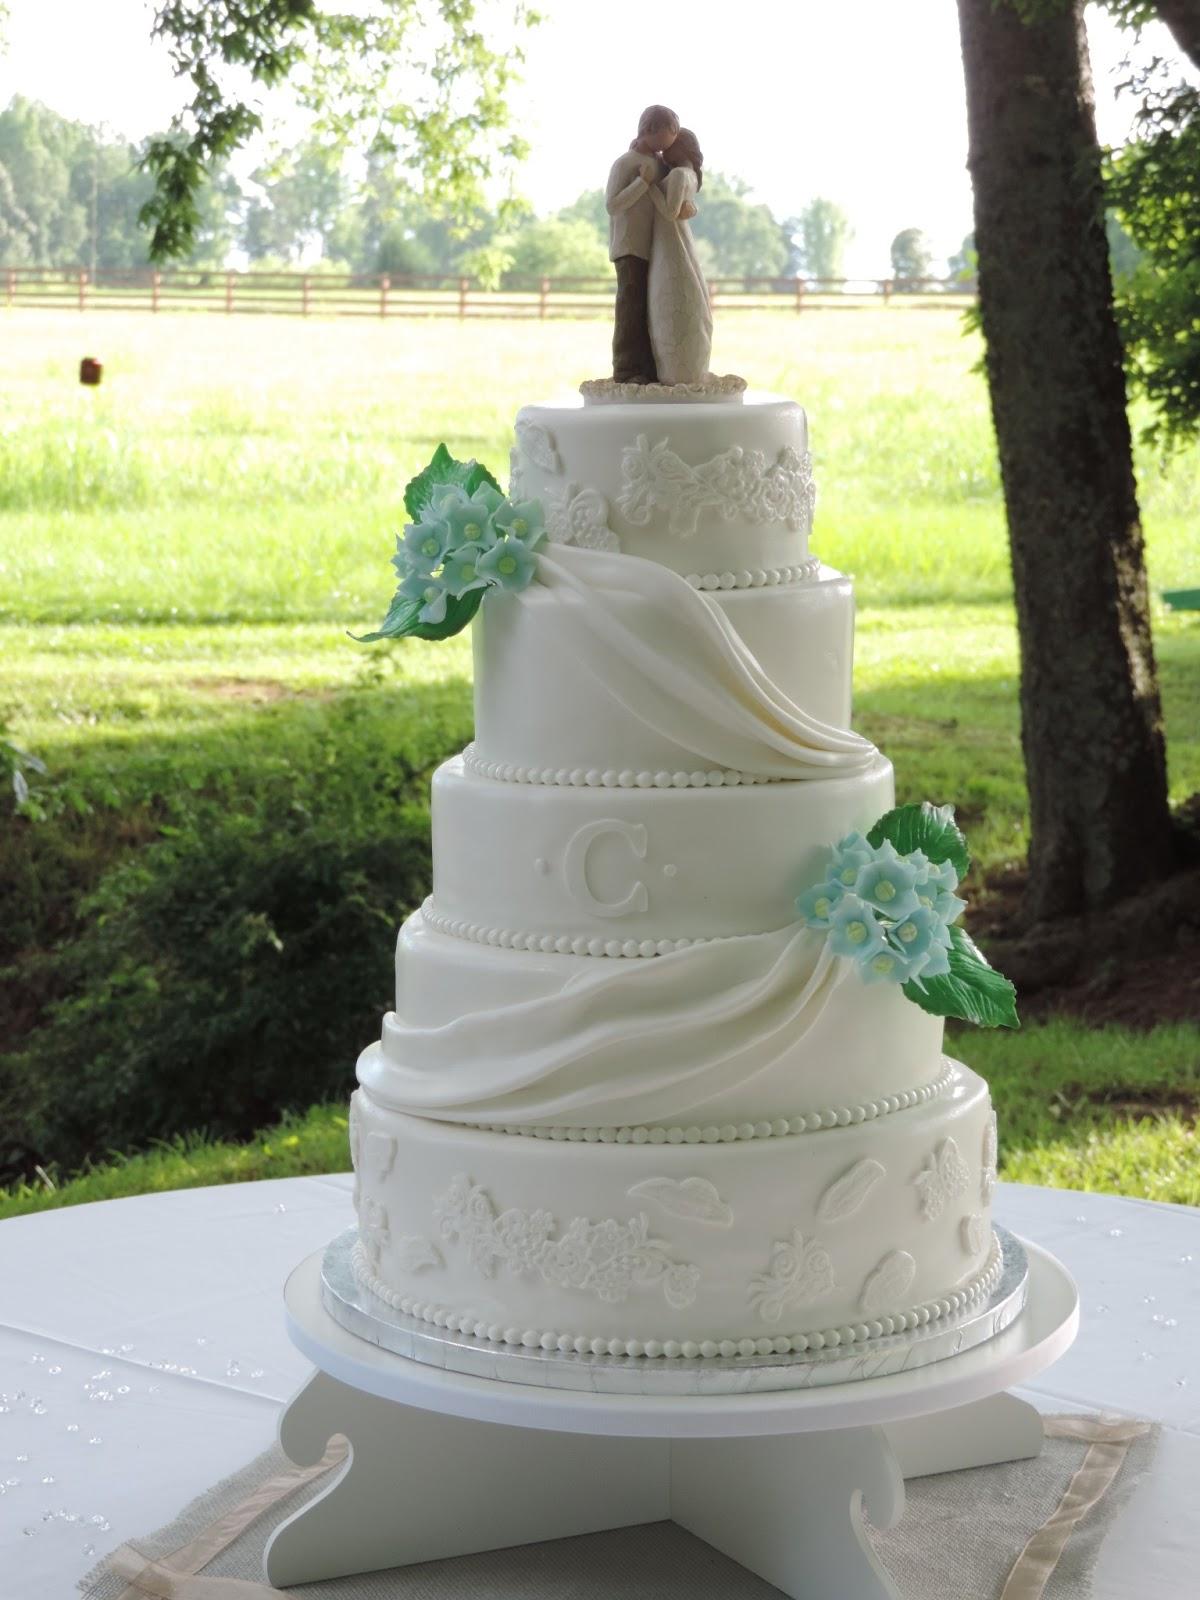 Cakes by Becky Elegant White Wedding Cake